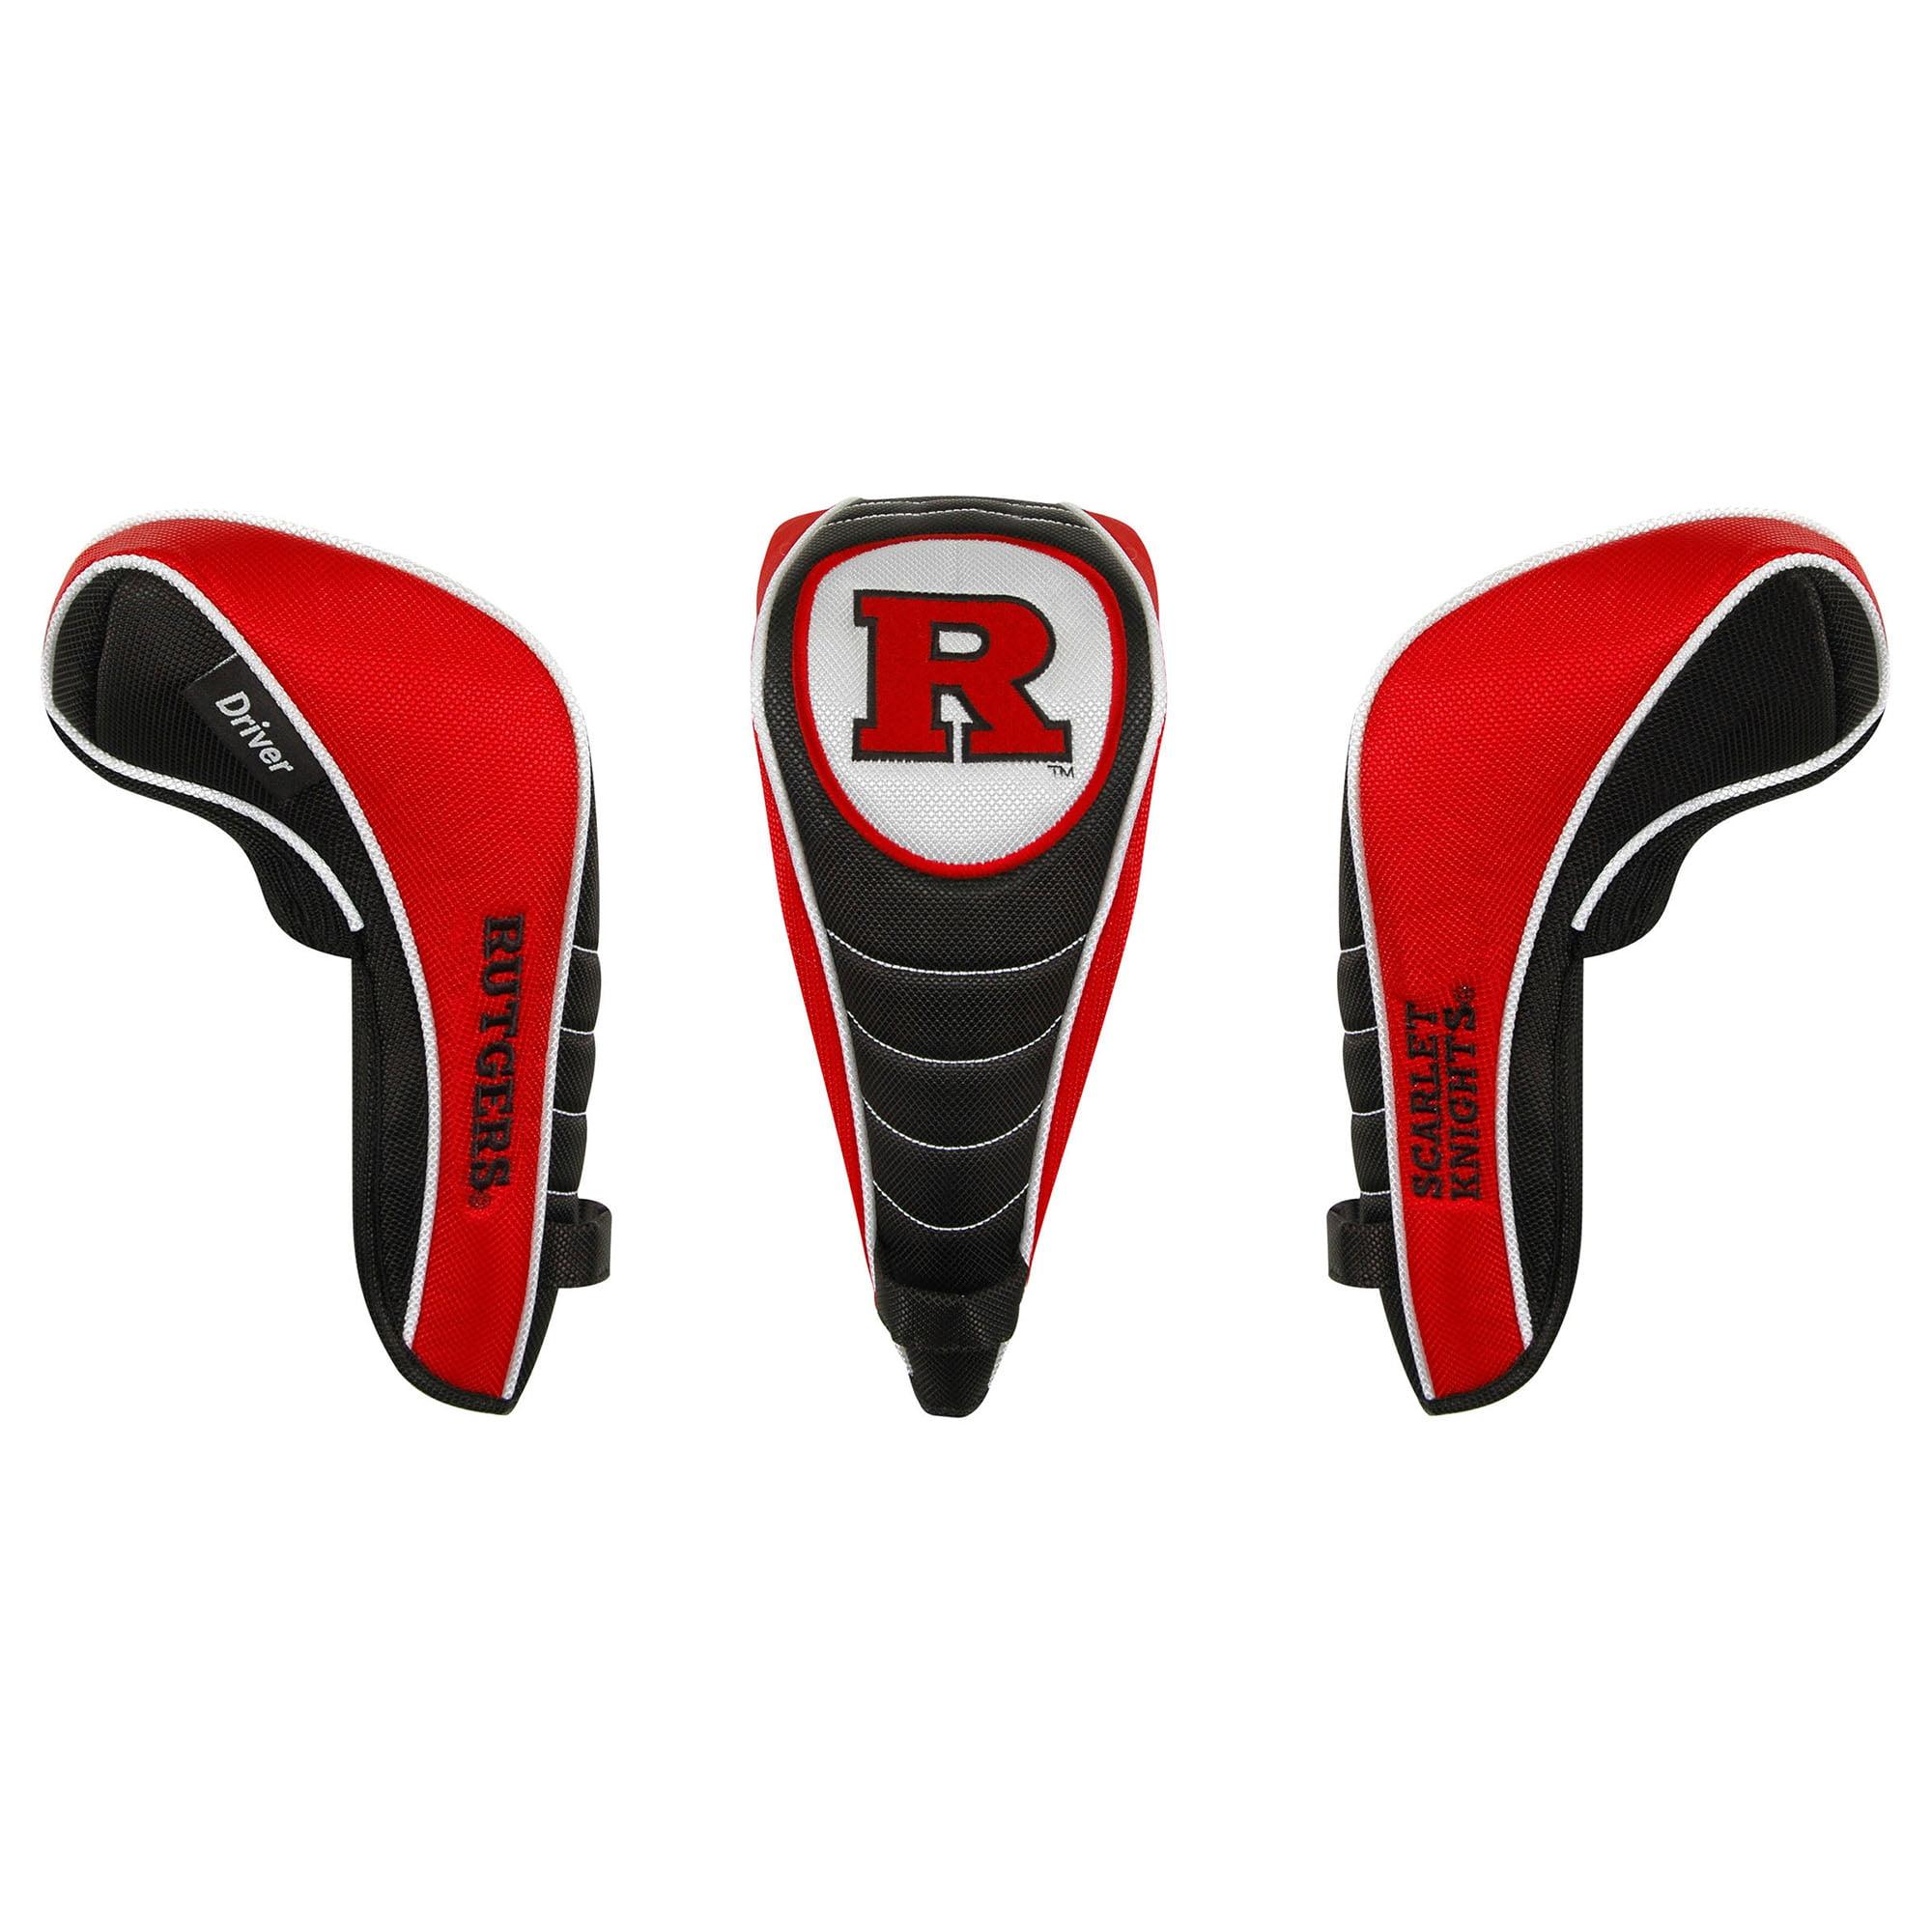 Team Effort Rutgers Scarlet Knights Golf Driver Headcover